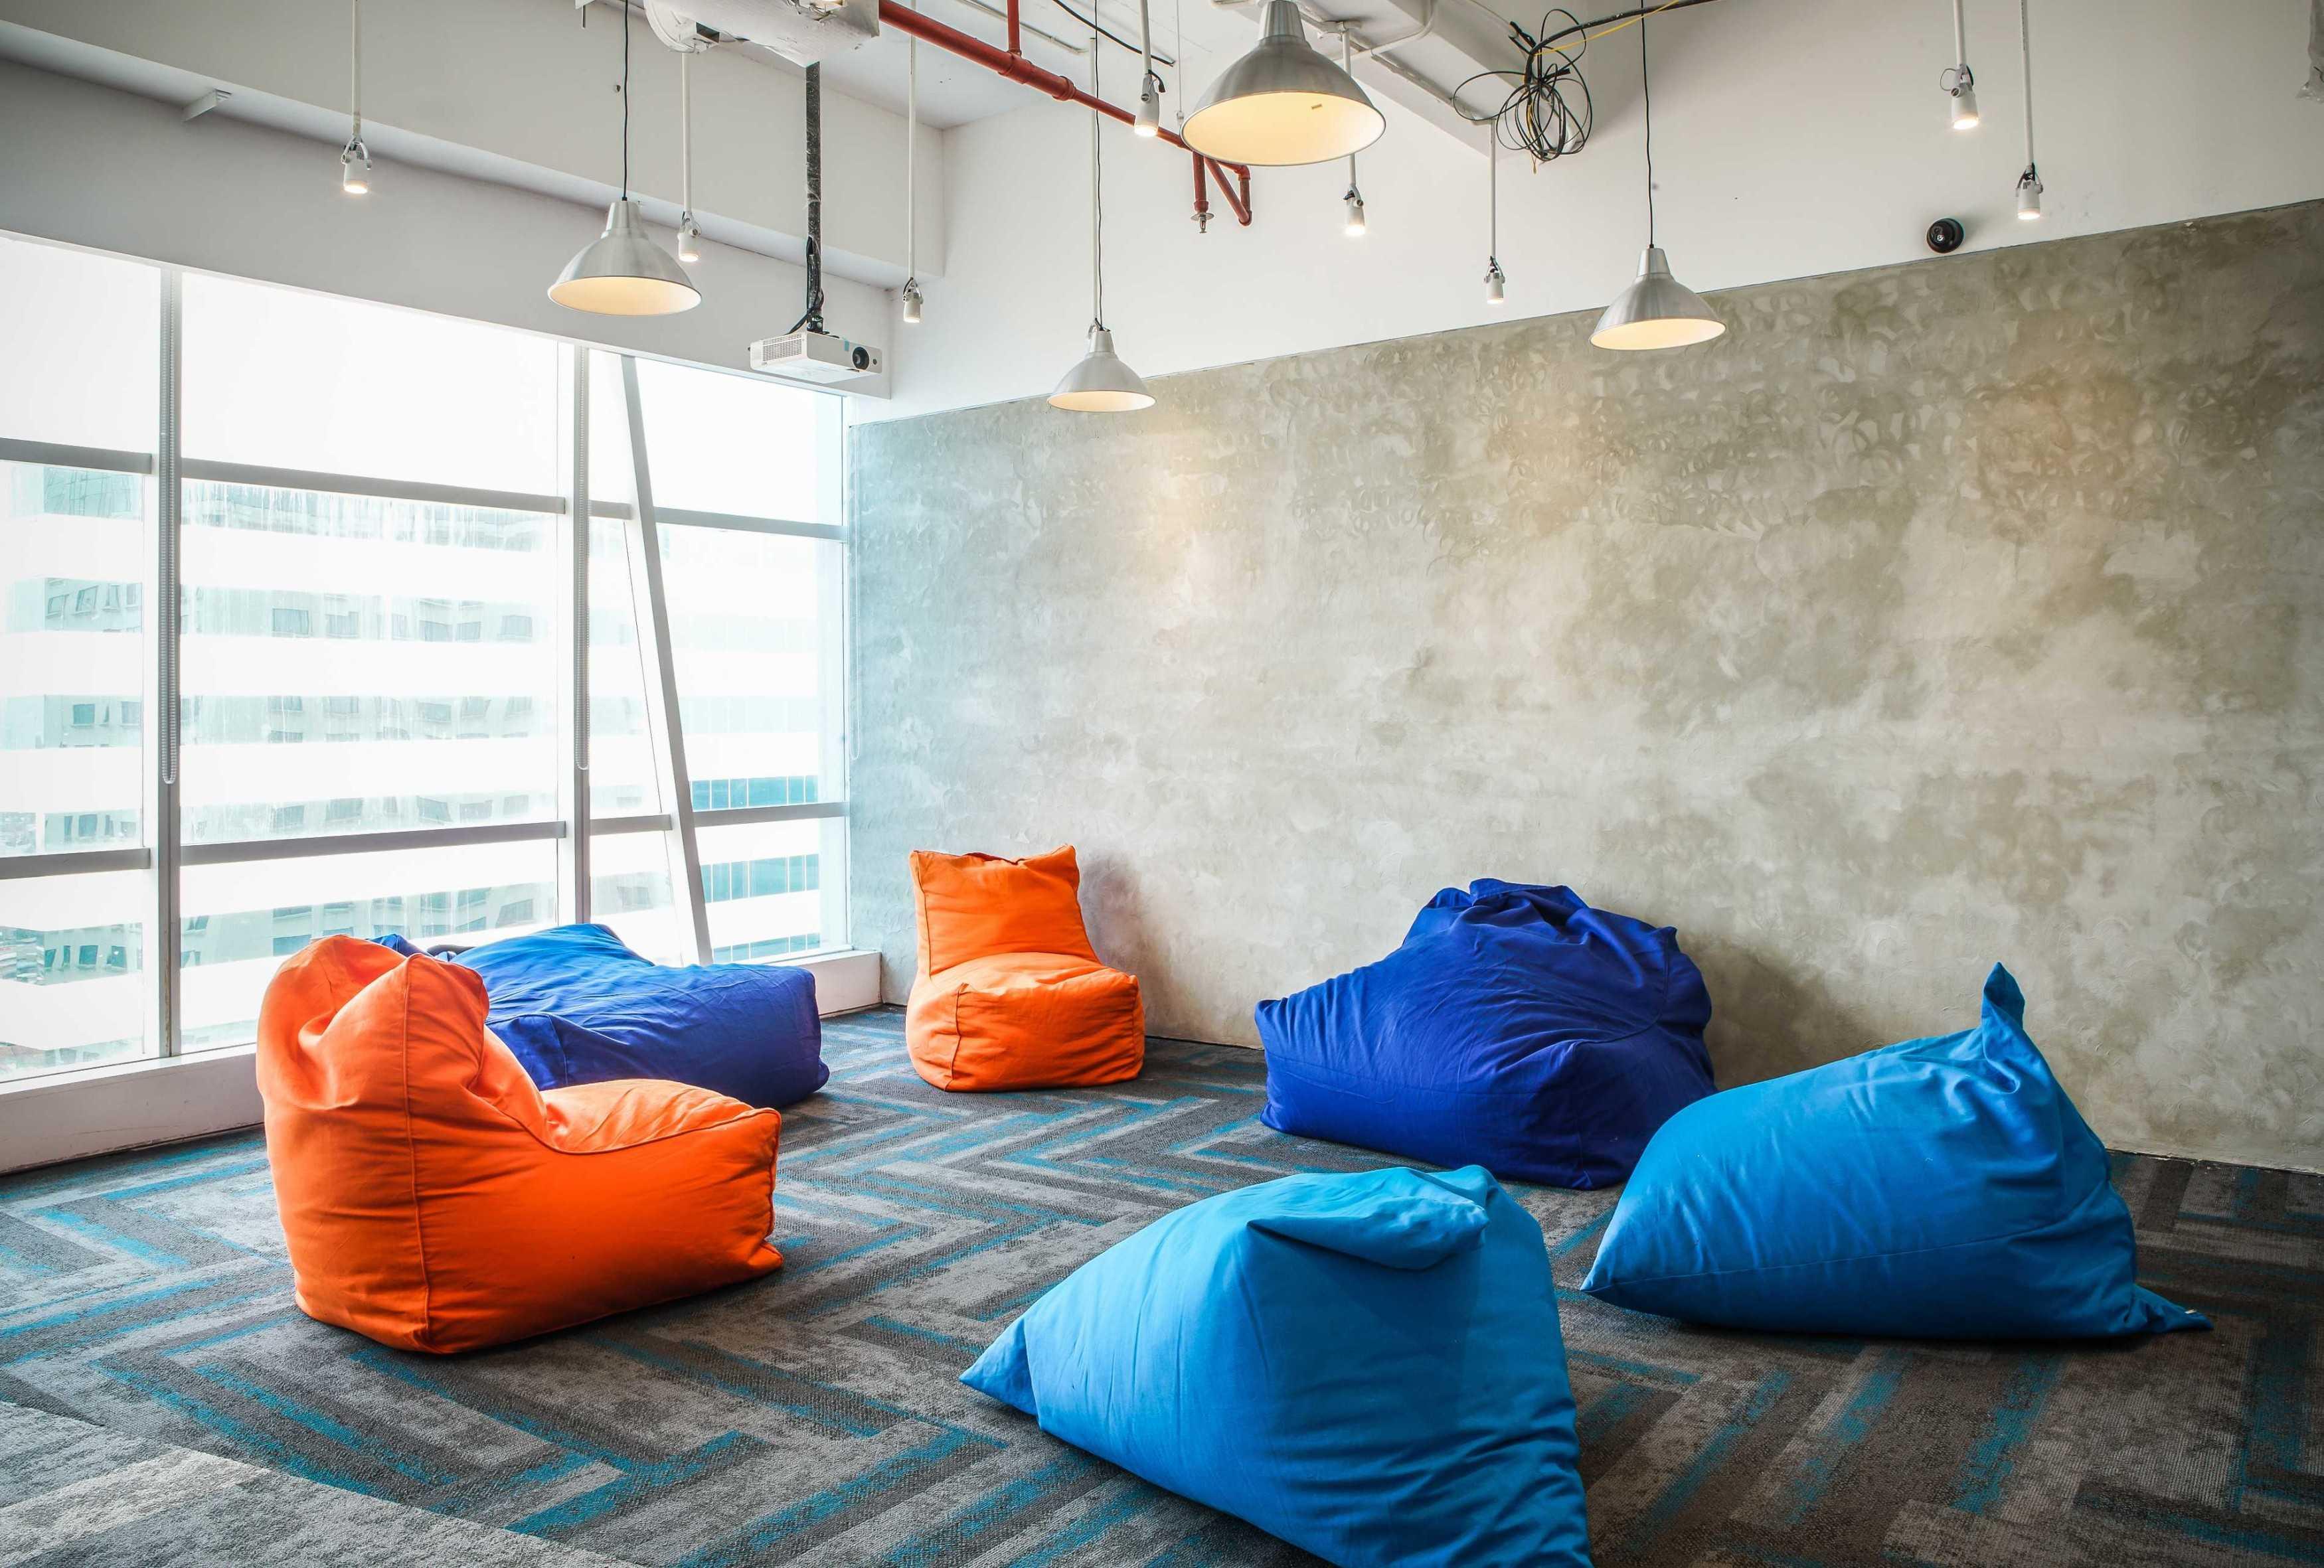 Design Intervention Tech Company Floor 19 Jakarta, Daerah Khusus Ibukota Jakarta, Indonesia Jakarta, Daerah Khusus Ibukota Jakarta, Indonesia Design-Intervention-Traveloka-19Th-Floor   71026